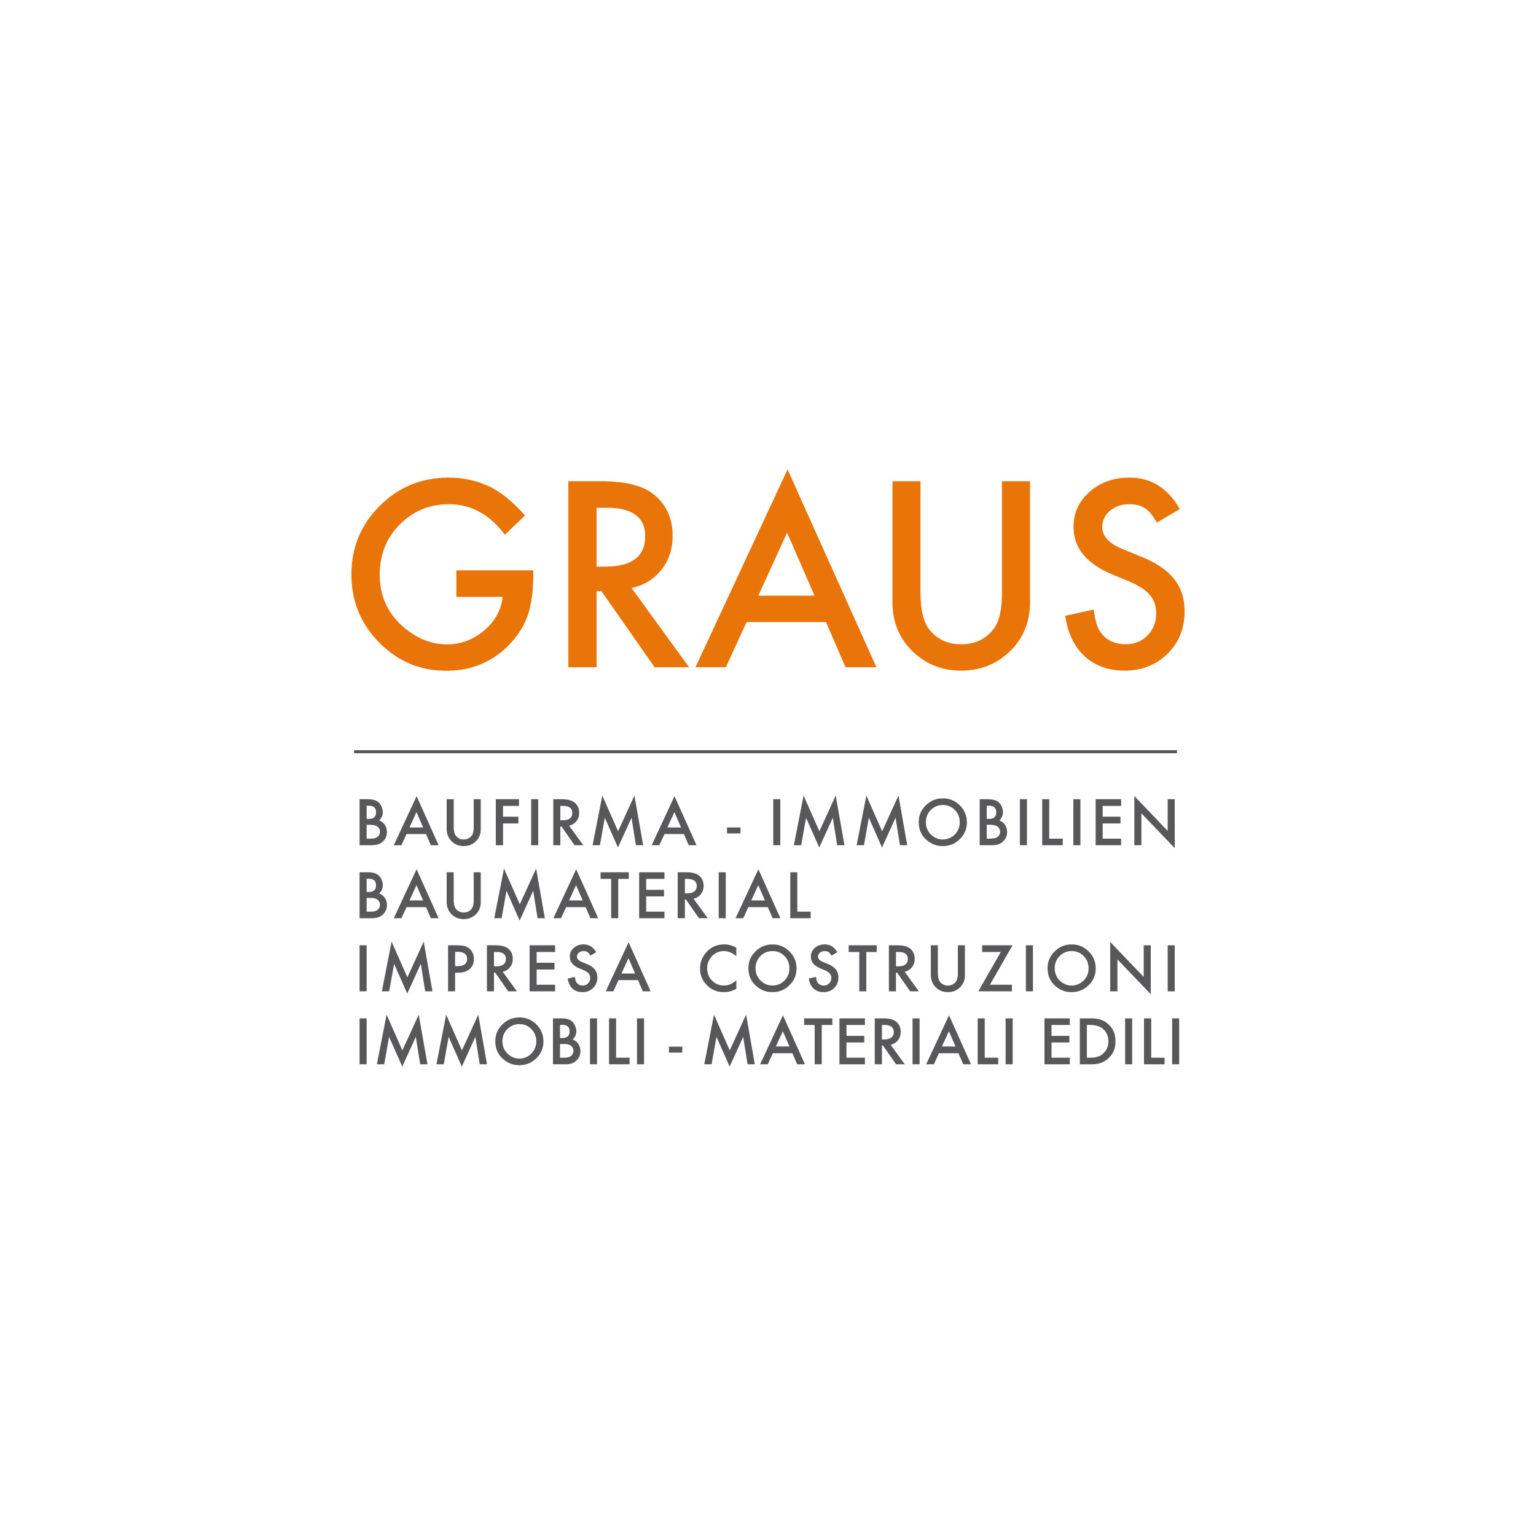 graus baumaterial logo